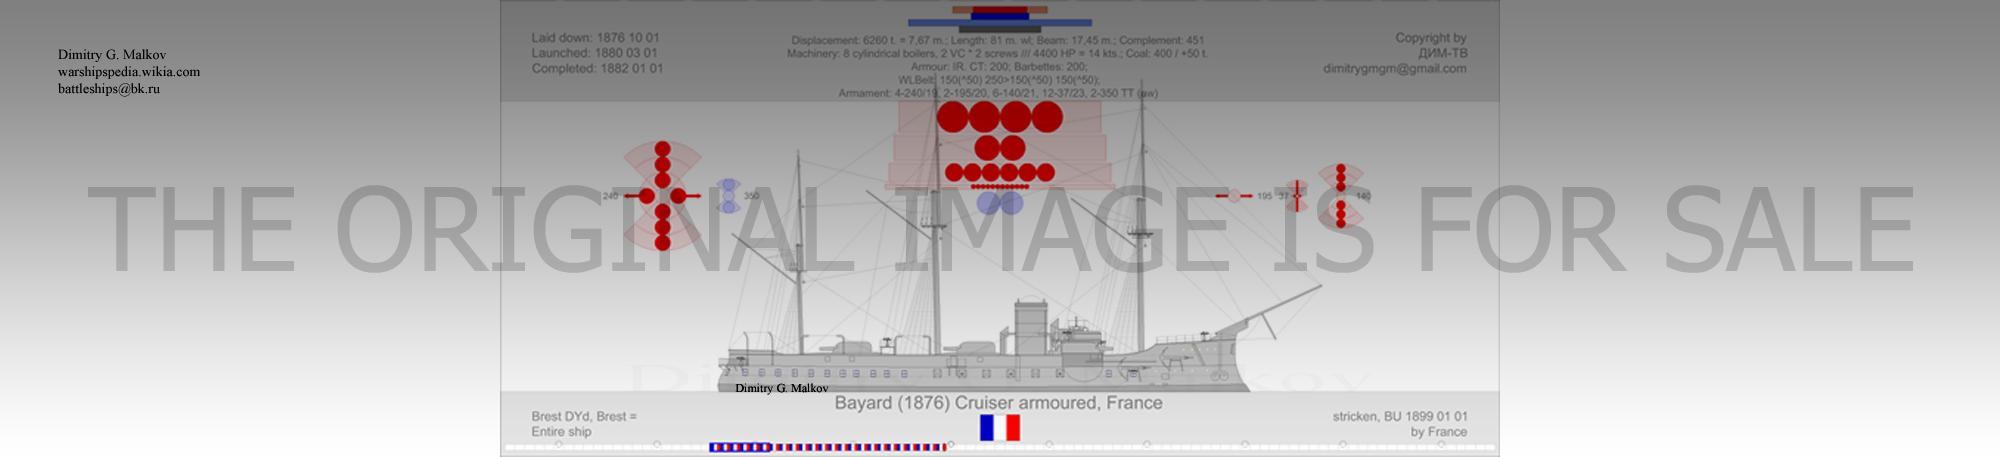 Mes dessins de navires français et de construction française - Page 2 Ca-18710